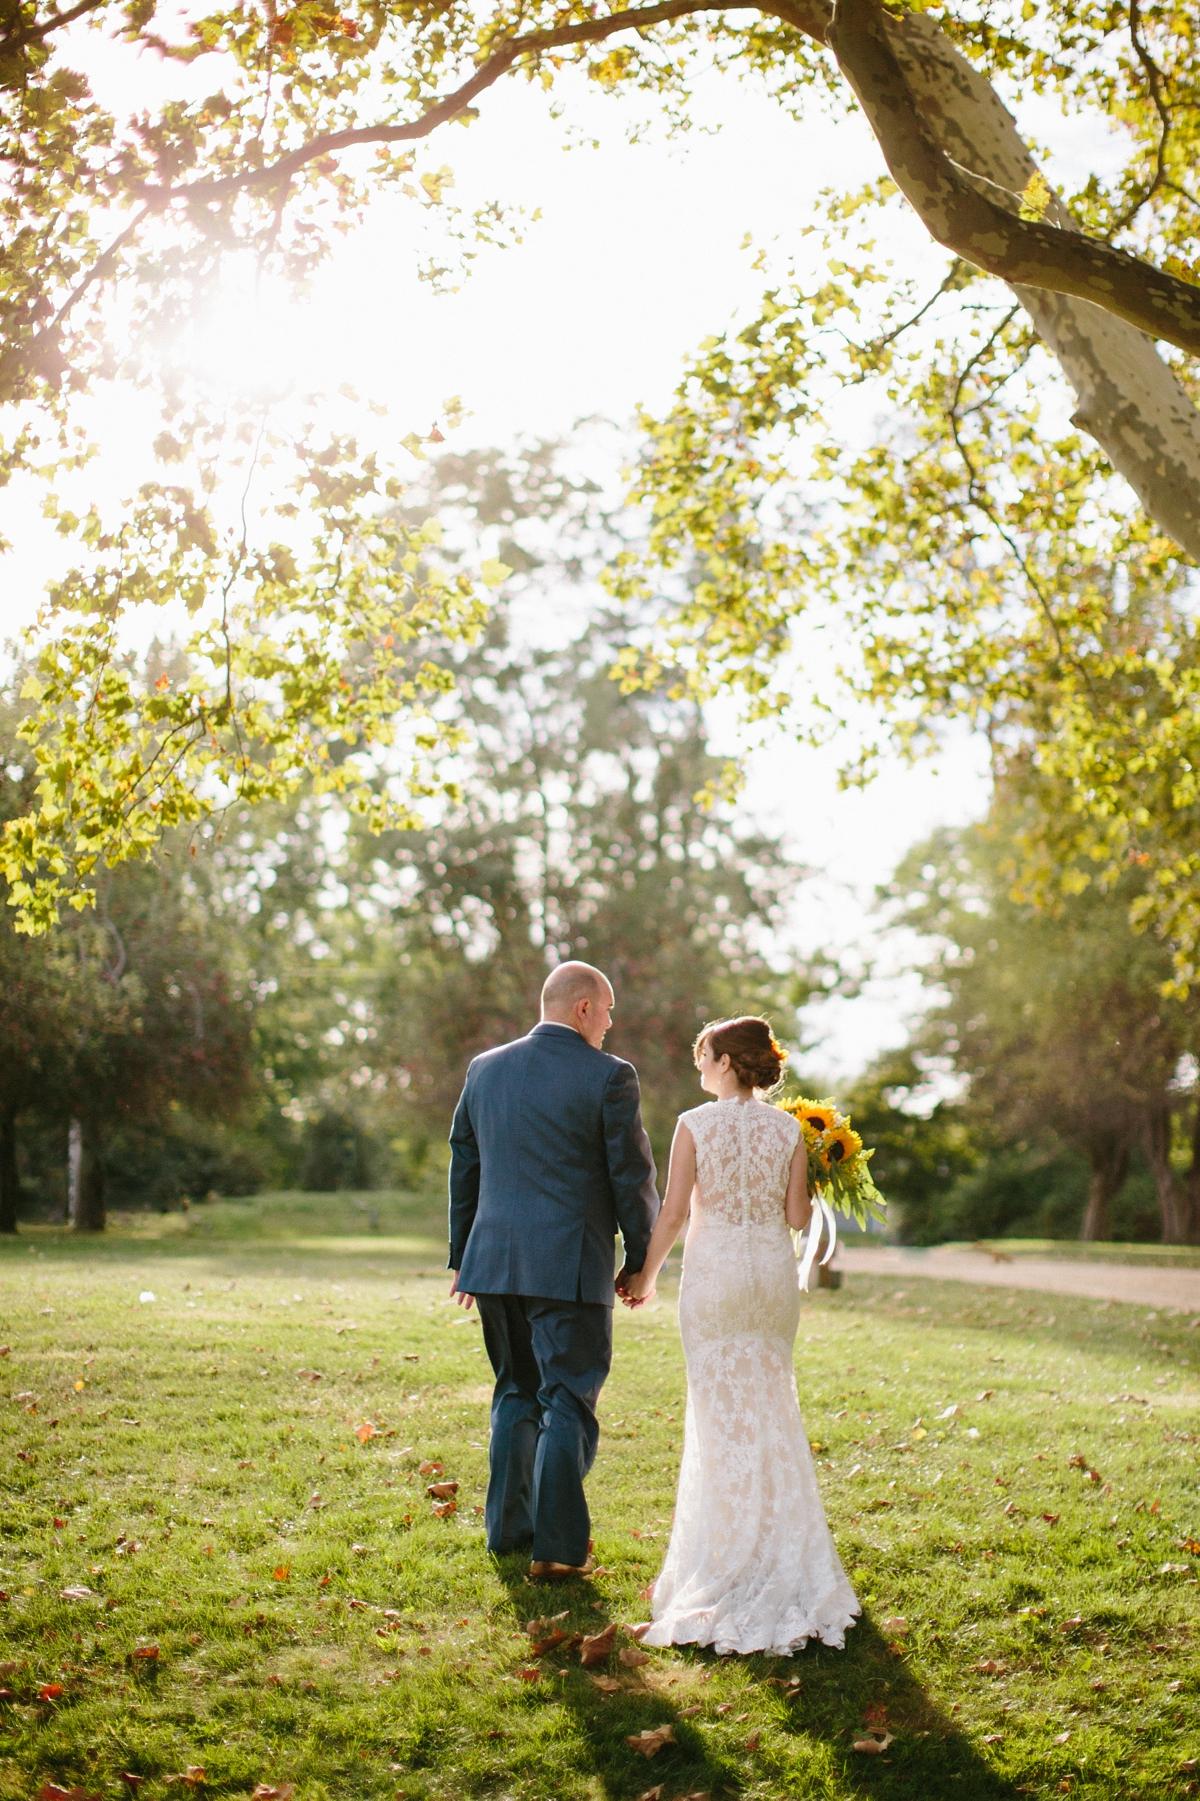 destination_wedding_photographer_estate_engagement_session_0055.jpg